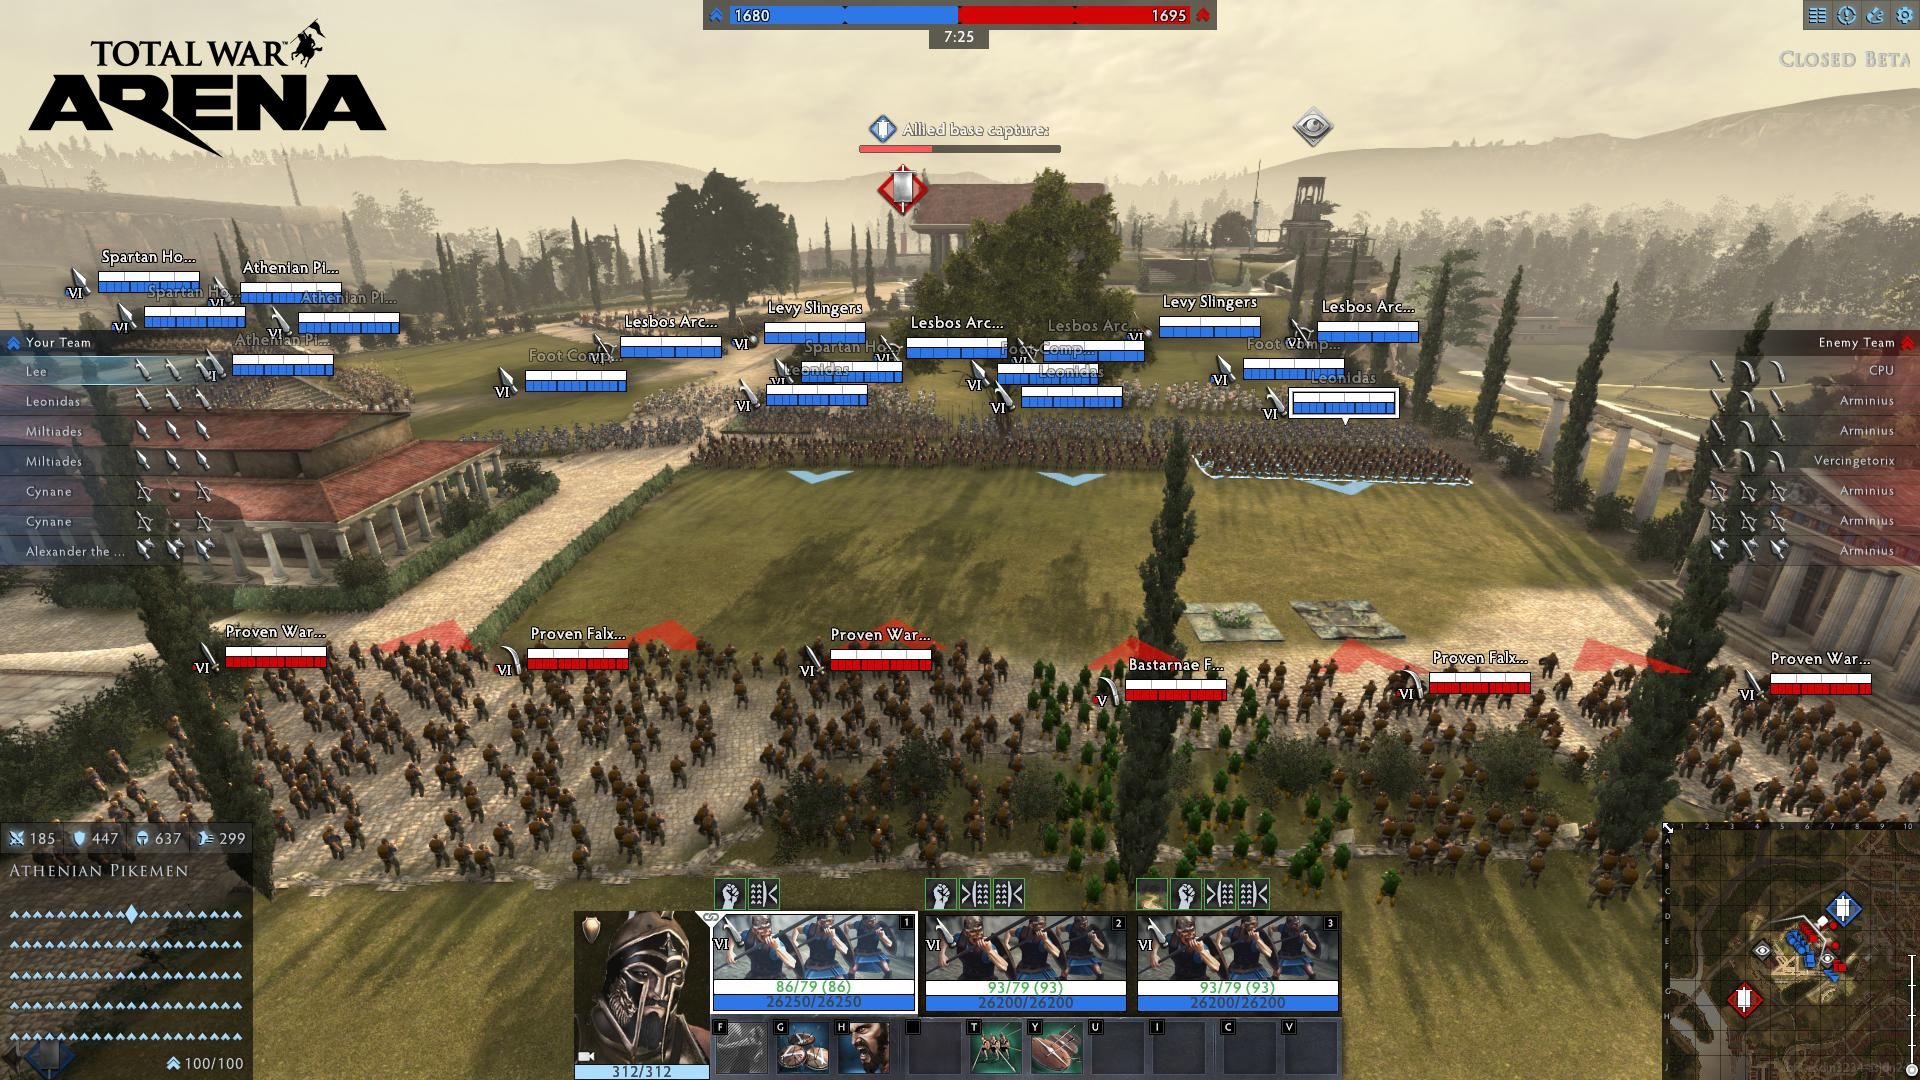 Total War Arena PAX Preview Battle Begins